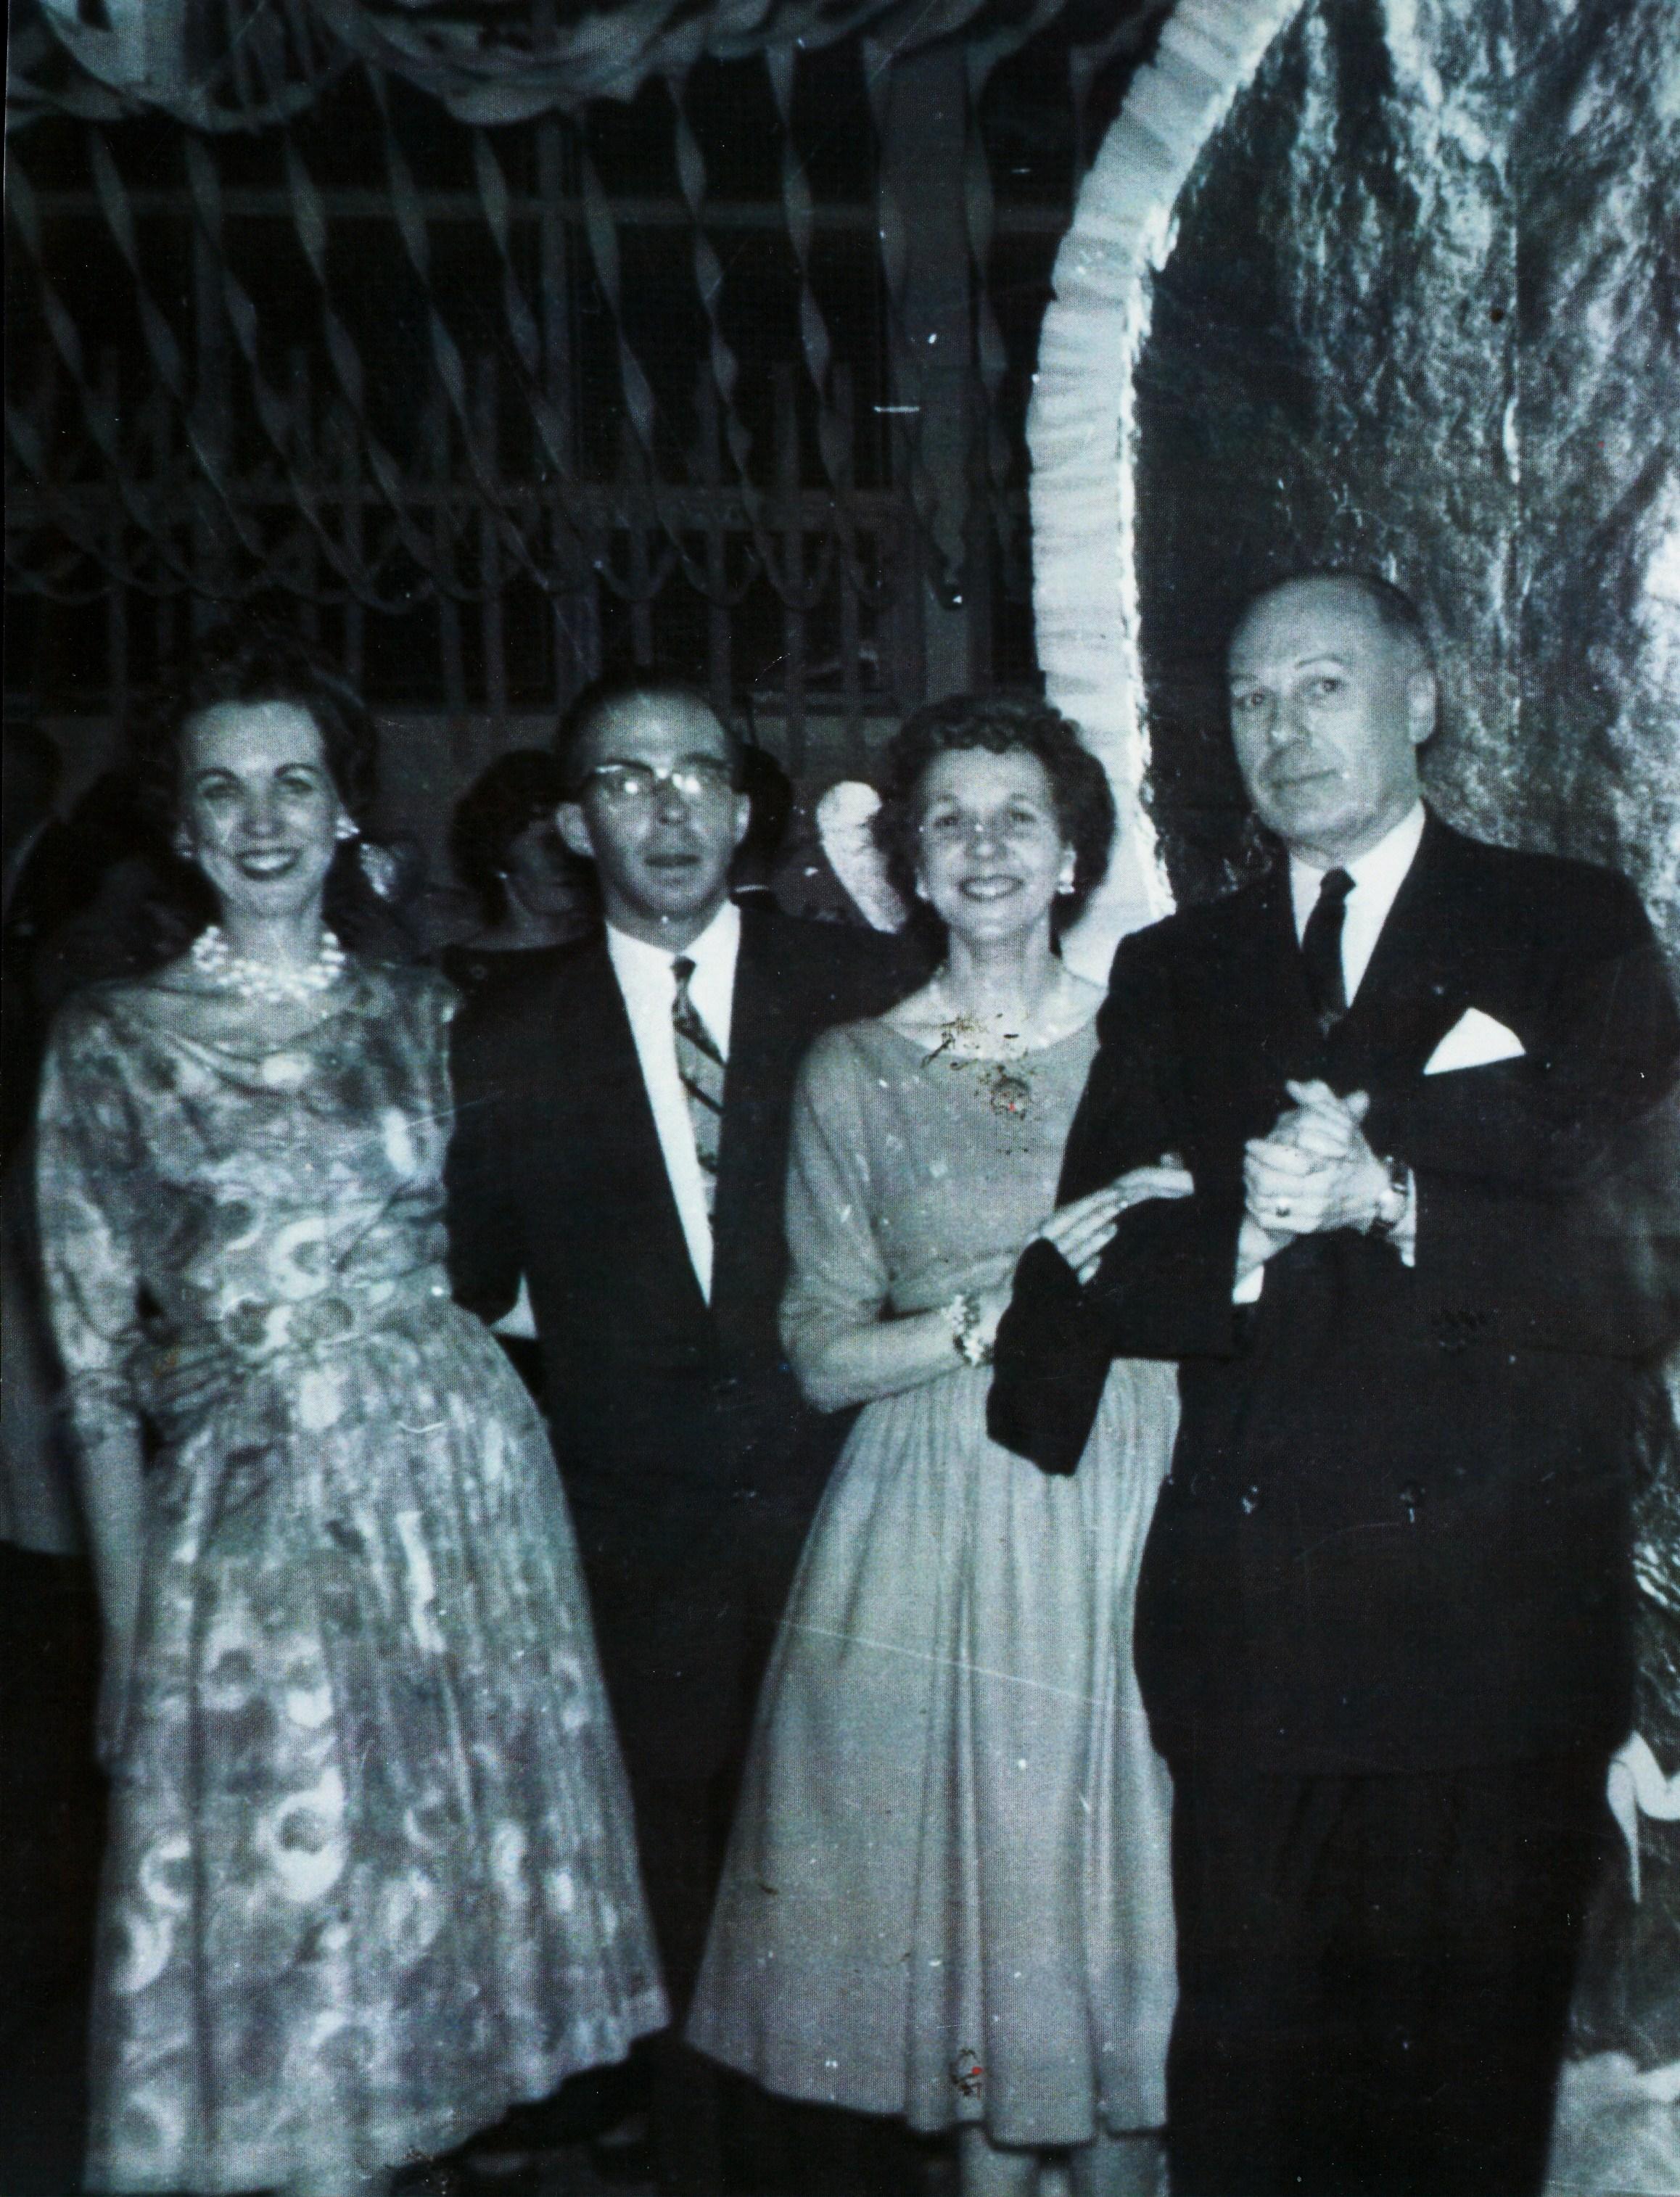 1962 Chaparones at high school formal, Lois Shatford, Dr. Bob Shatford, Helen Jones, Sally Jones